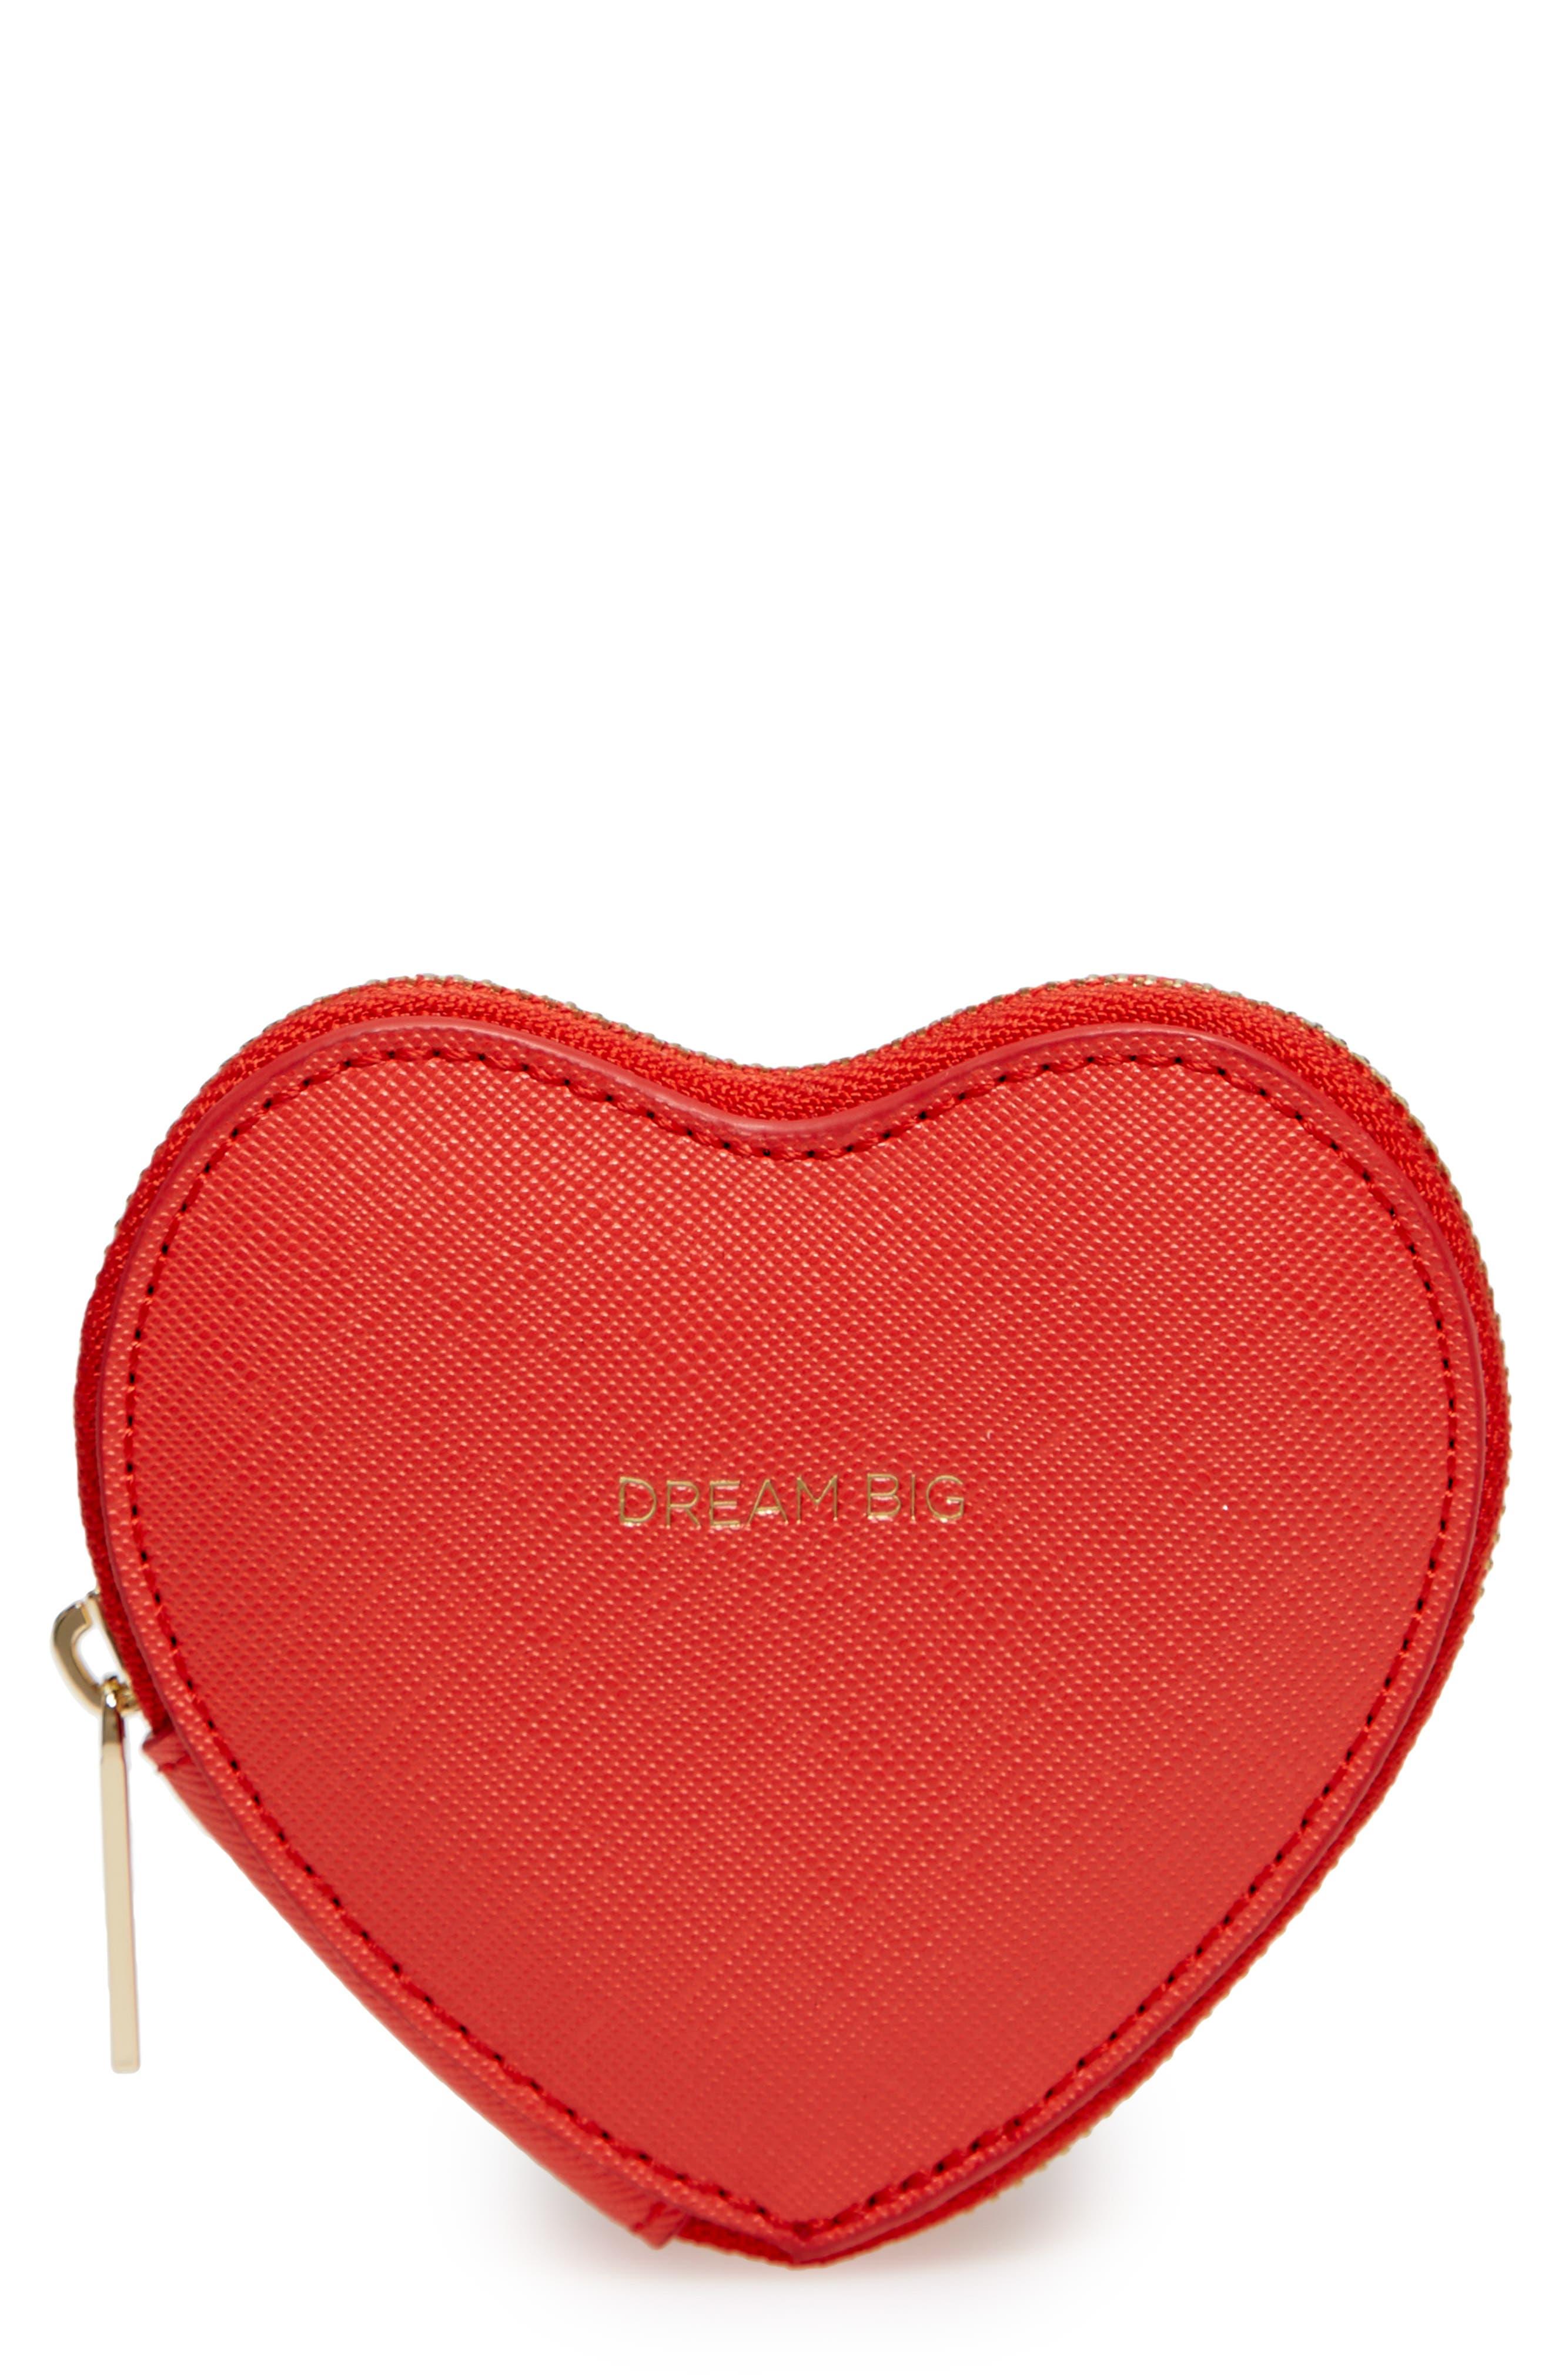 Estella Bartlett Dream Big Heart Faux Leather Coin Purse